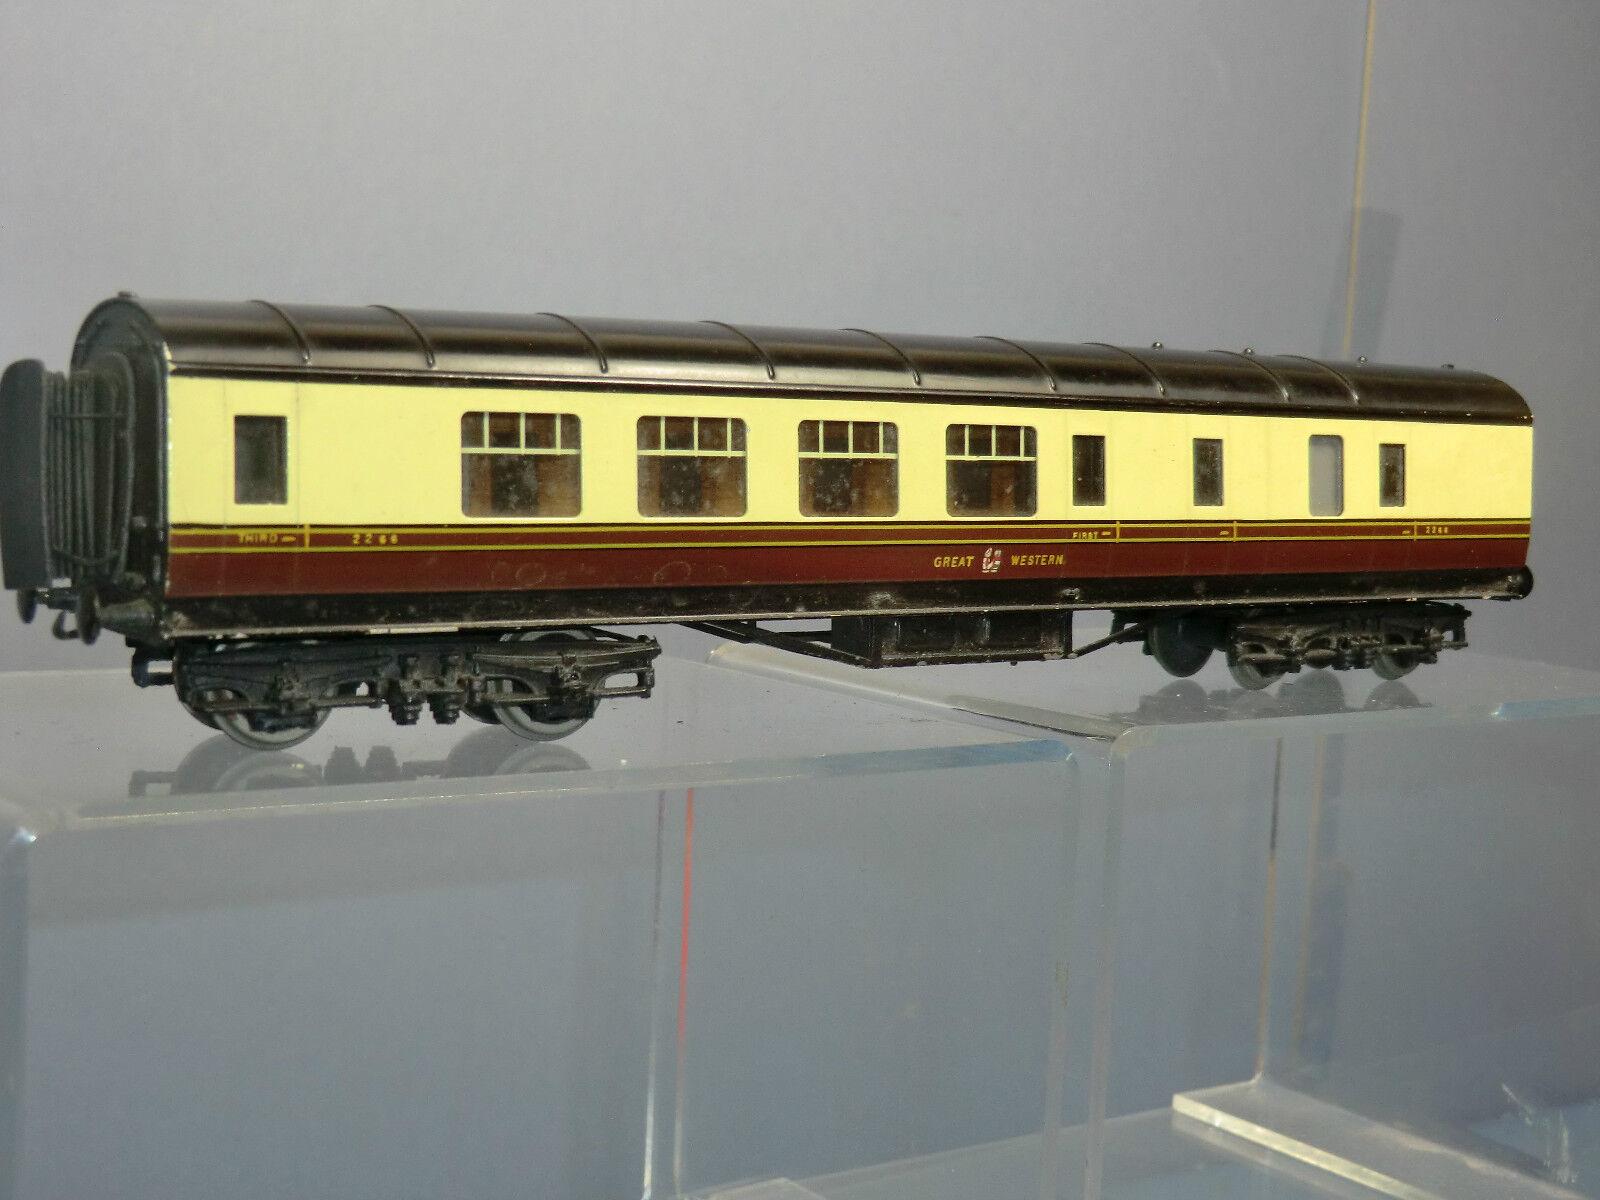 Modelo retroexley (00) K5   W GW GW GW 1   3 frenos combinados - Vn MIB f01